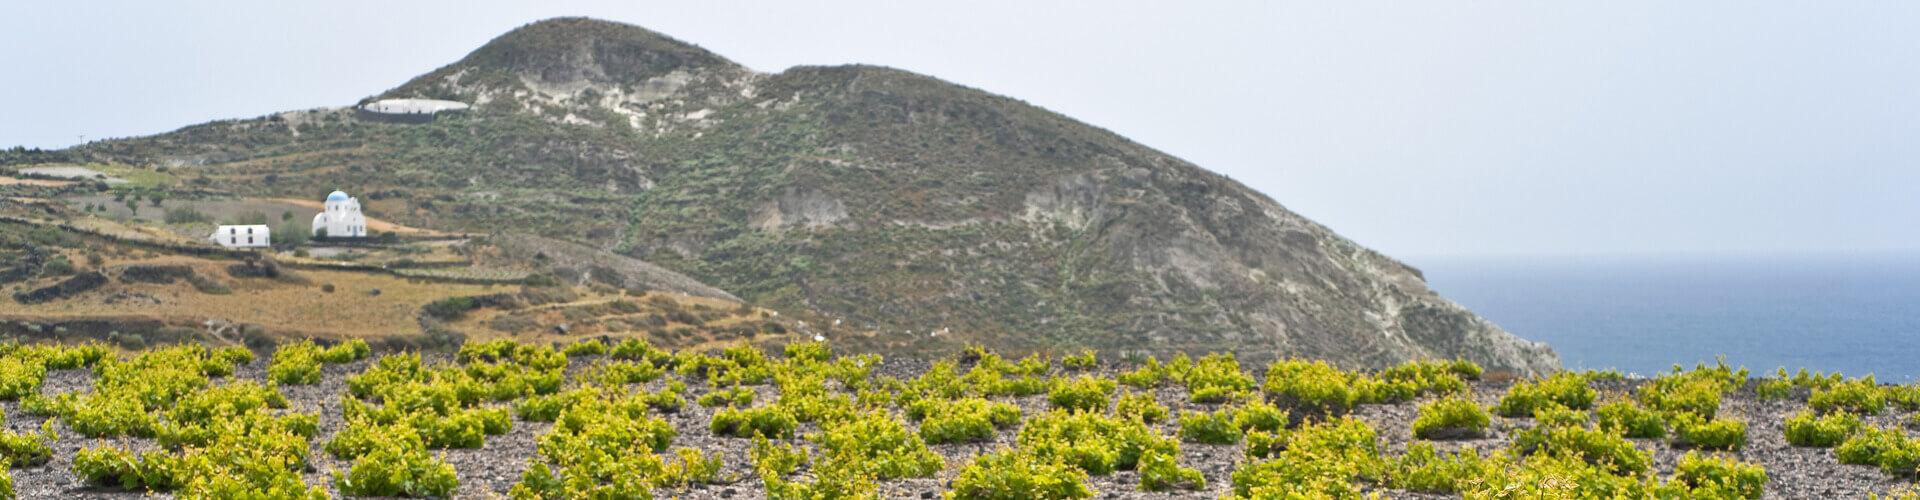 The 7 Best Wineries to Explore in Santorini - Kamari Tours Excursions